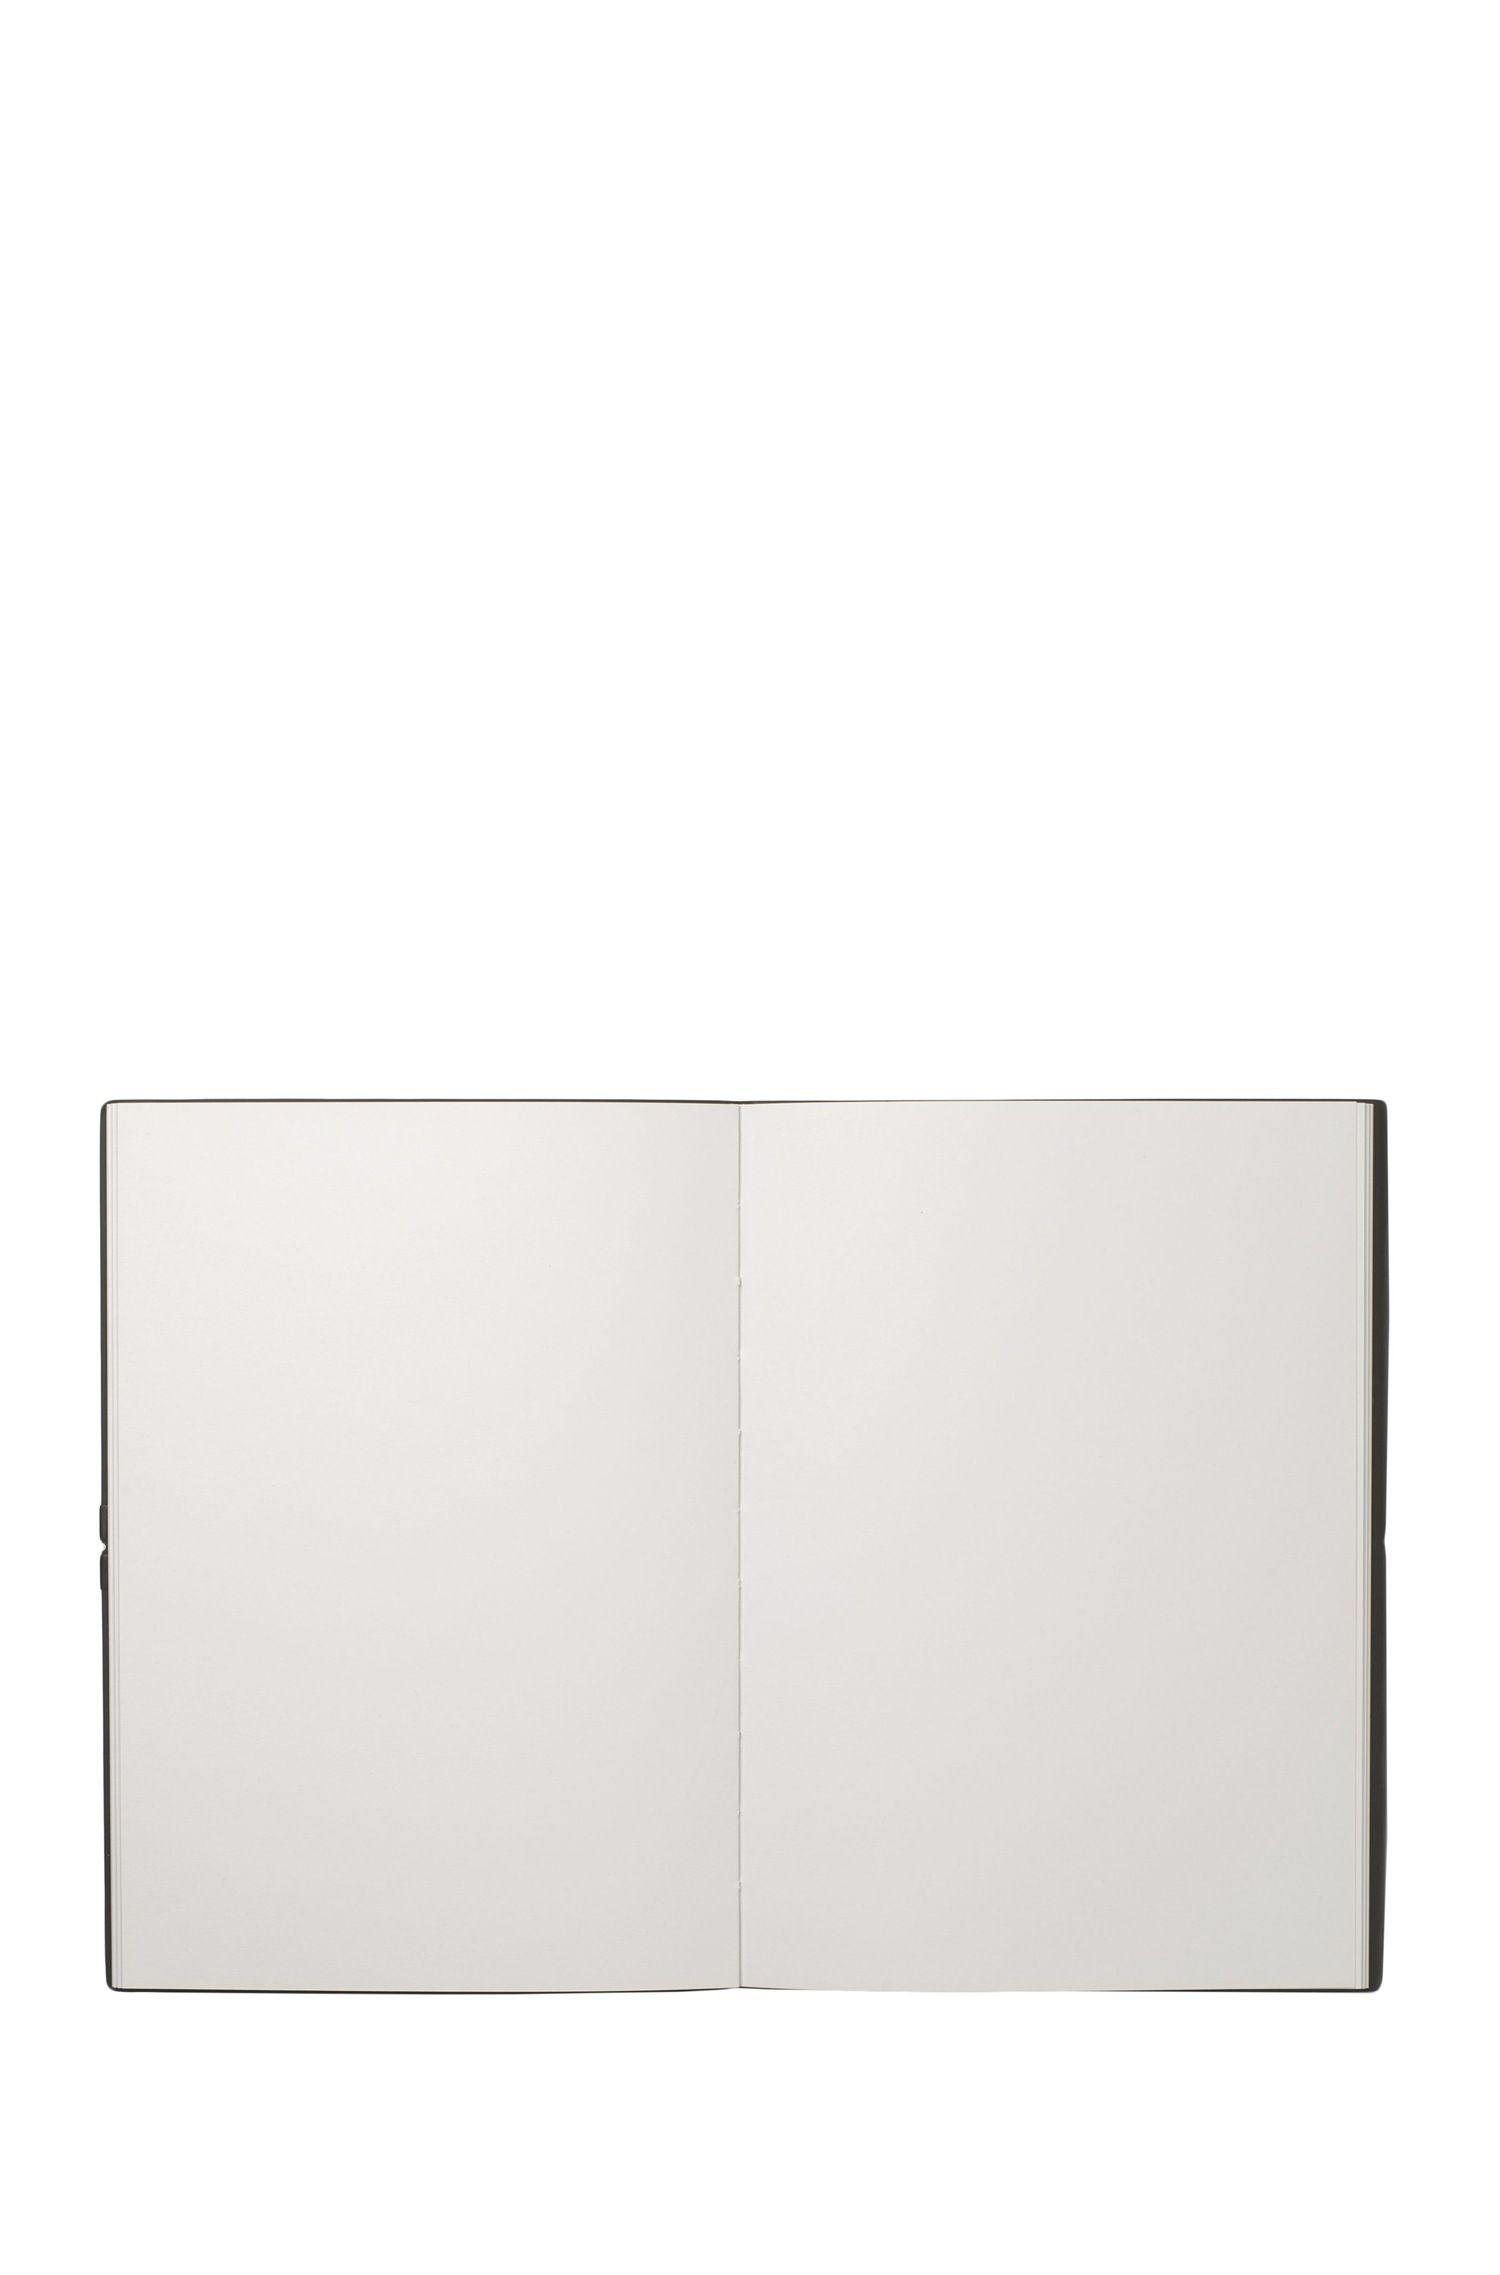 DIN A5 Notizbuch mit Gummiband: 'Basis'